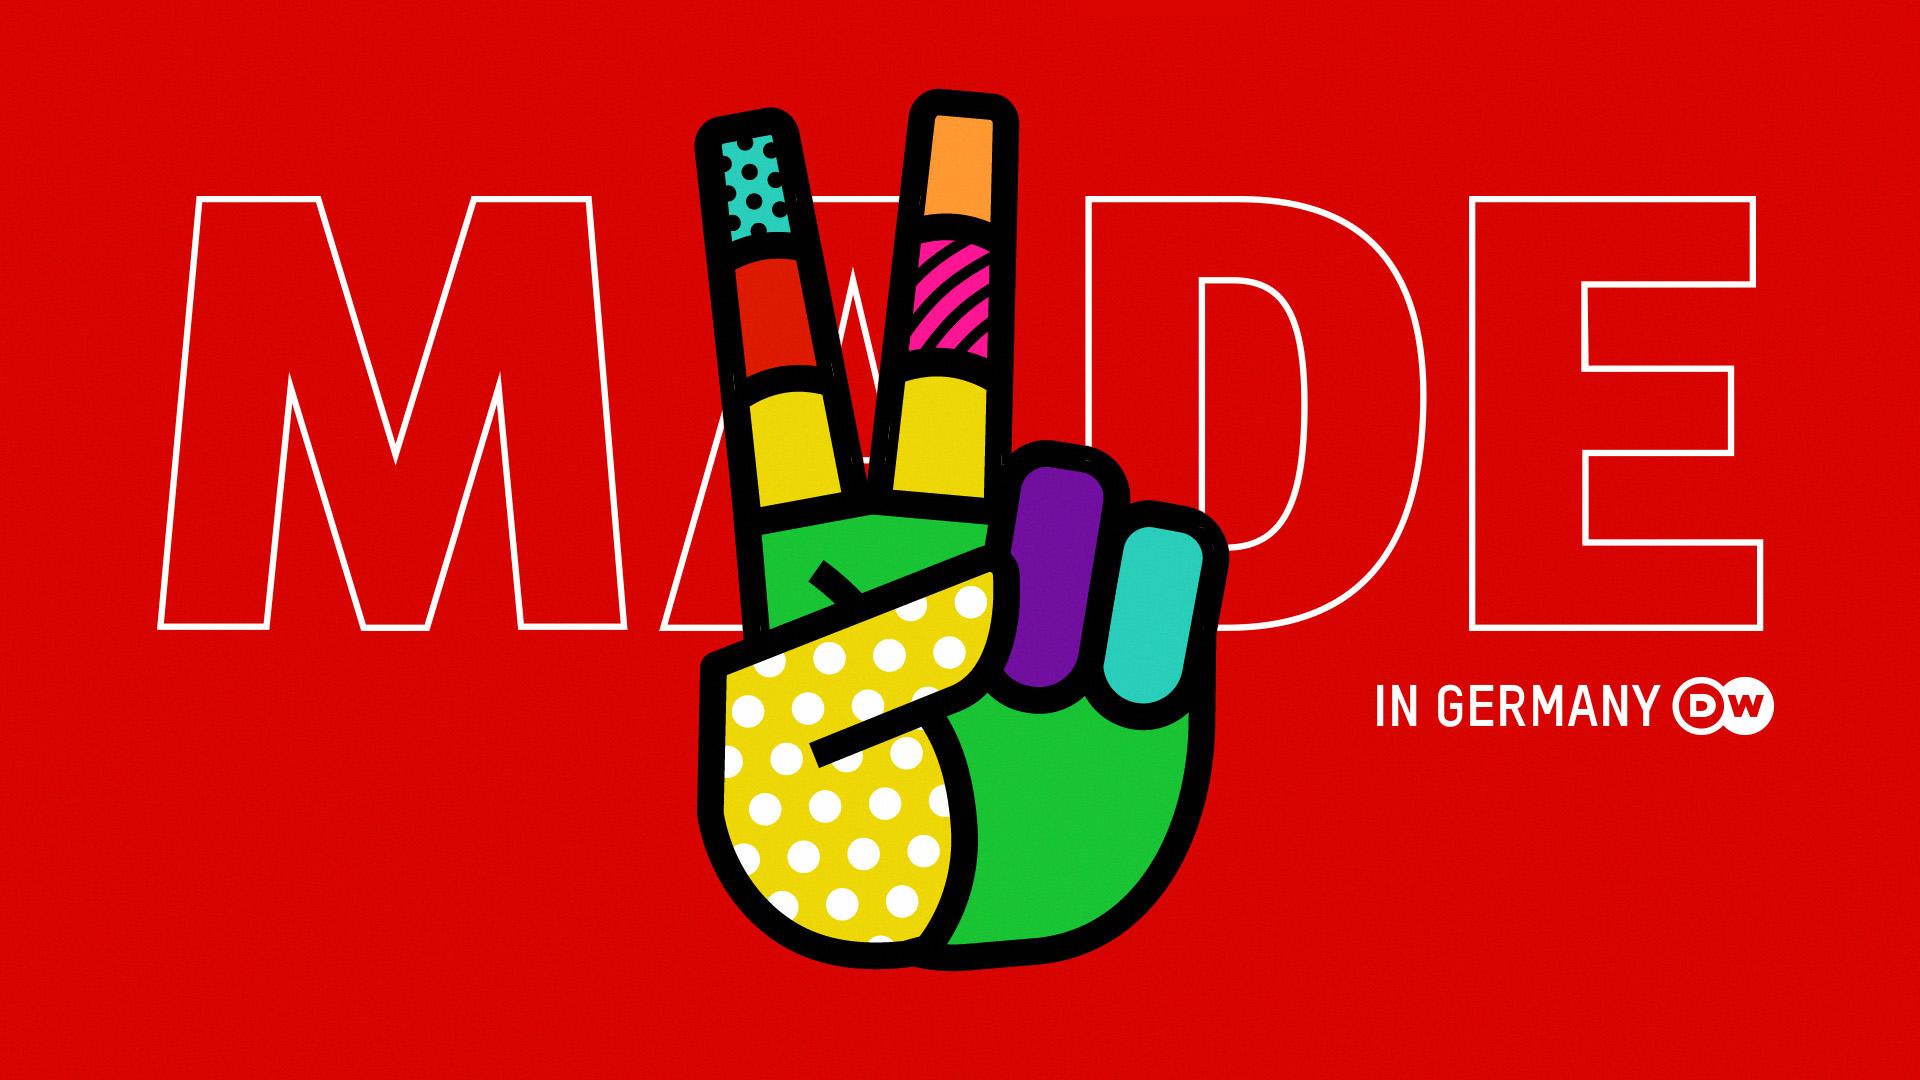 DW MADE Header logo peace hand sign